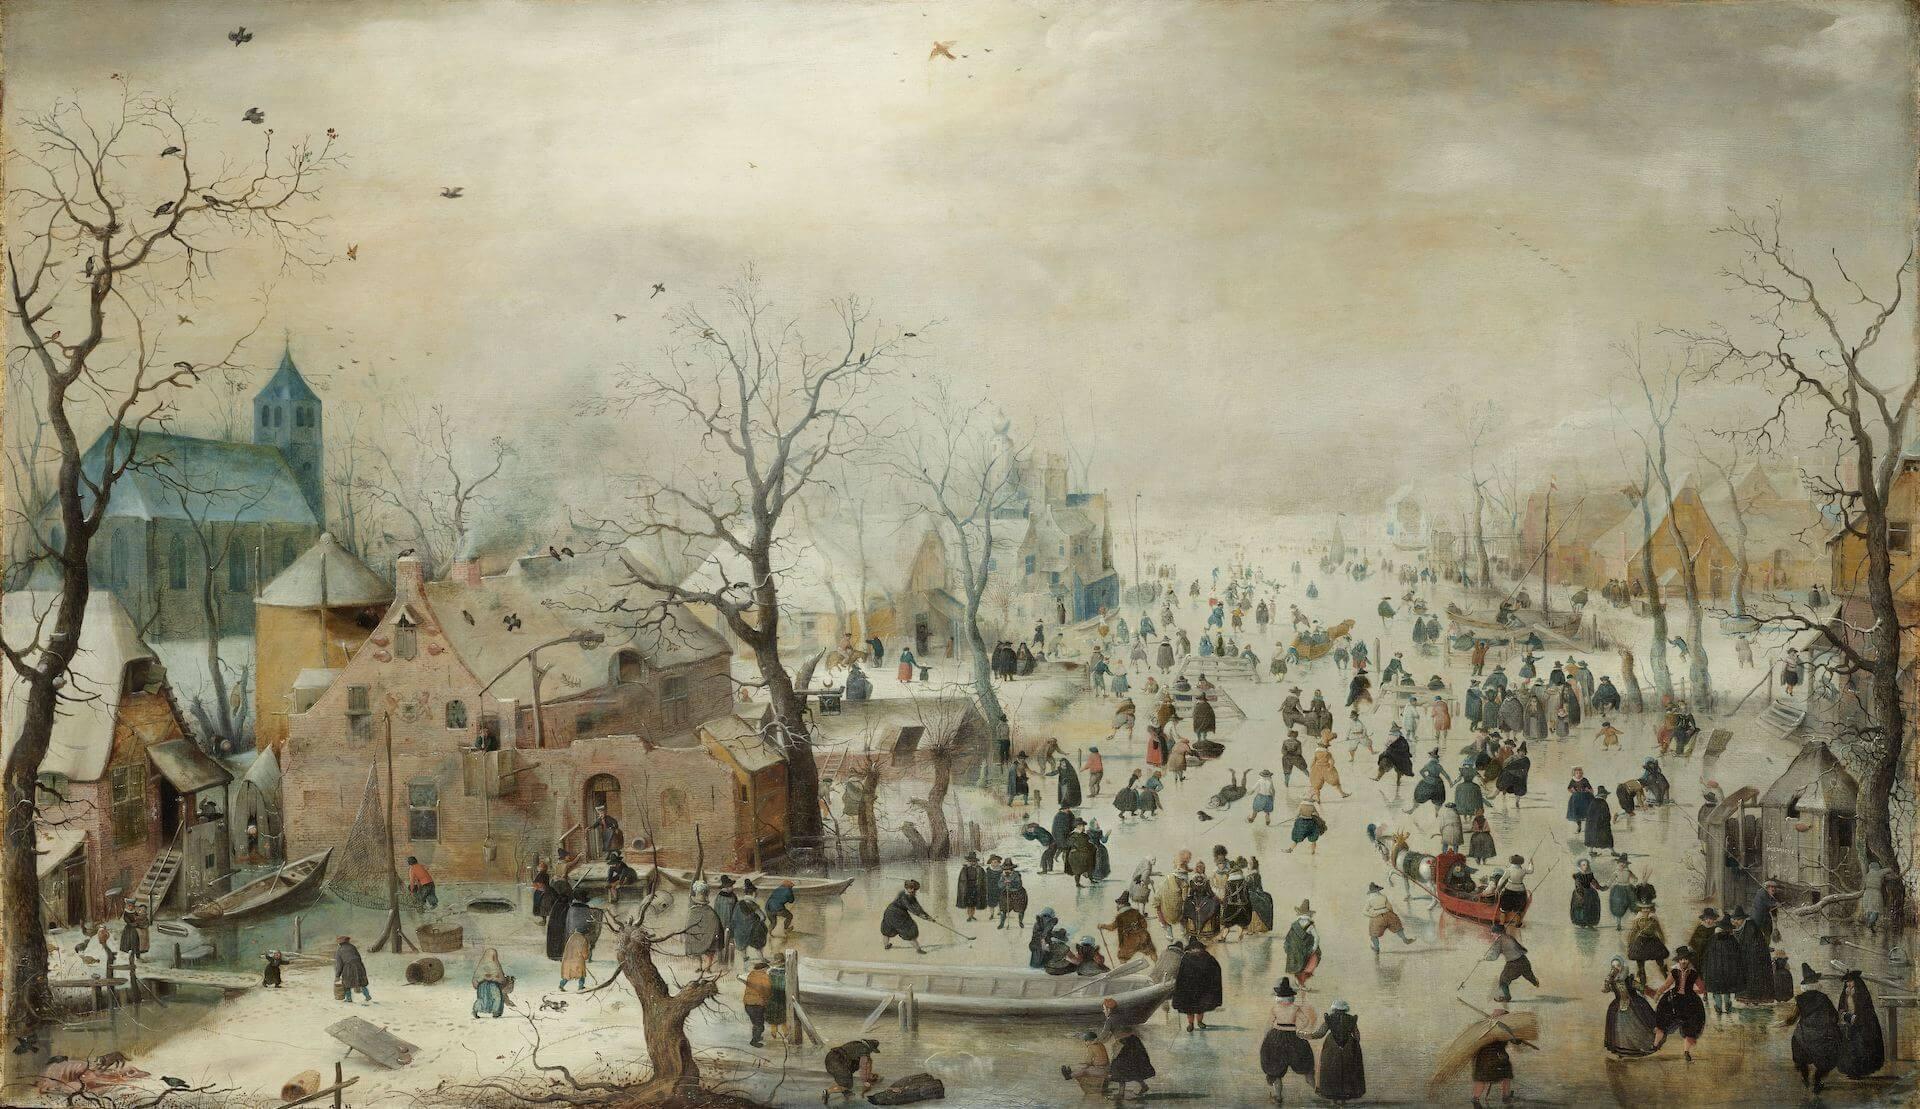 Paisaje invernal con patinadores Hendrick Avercamp